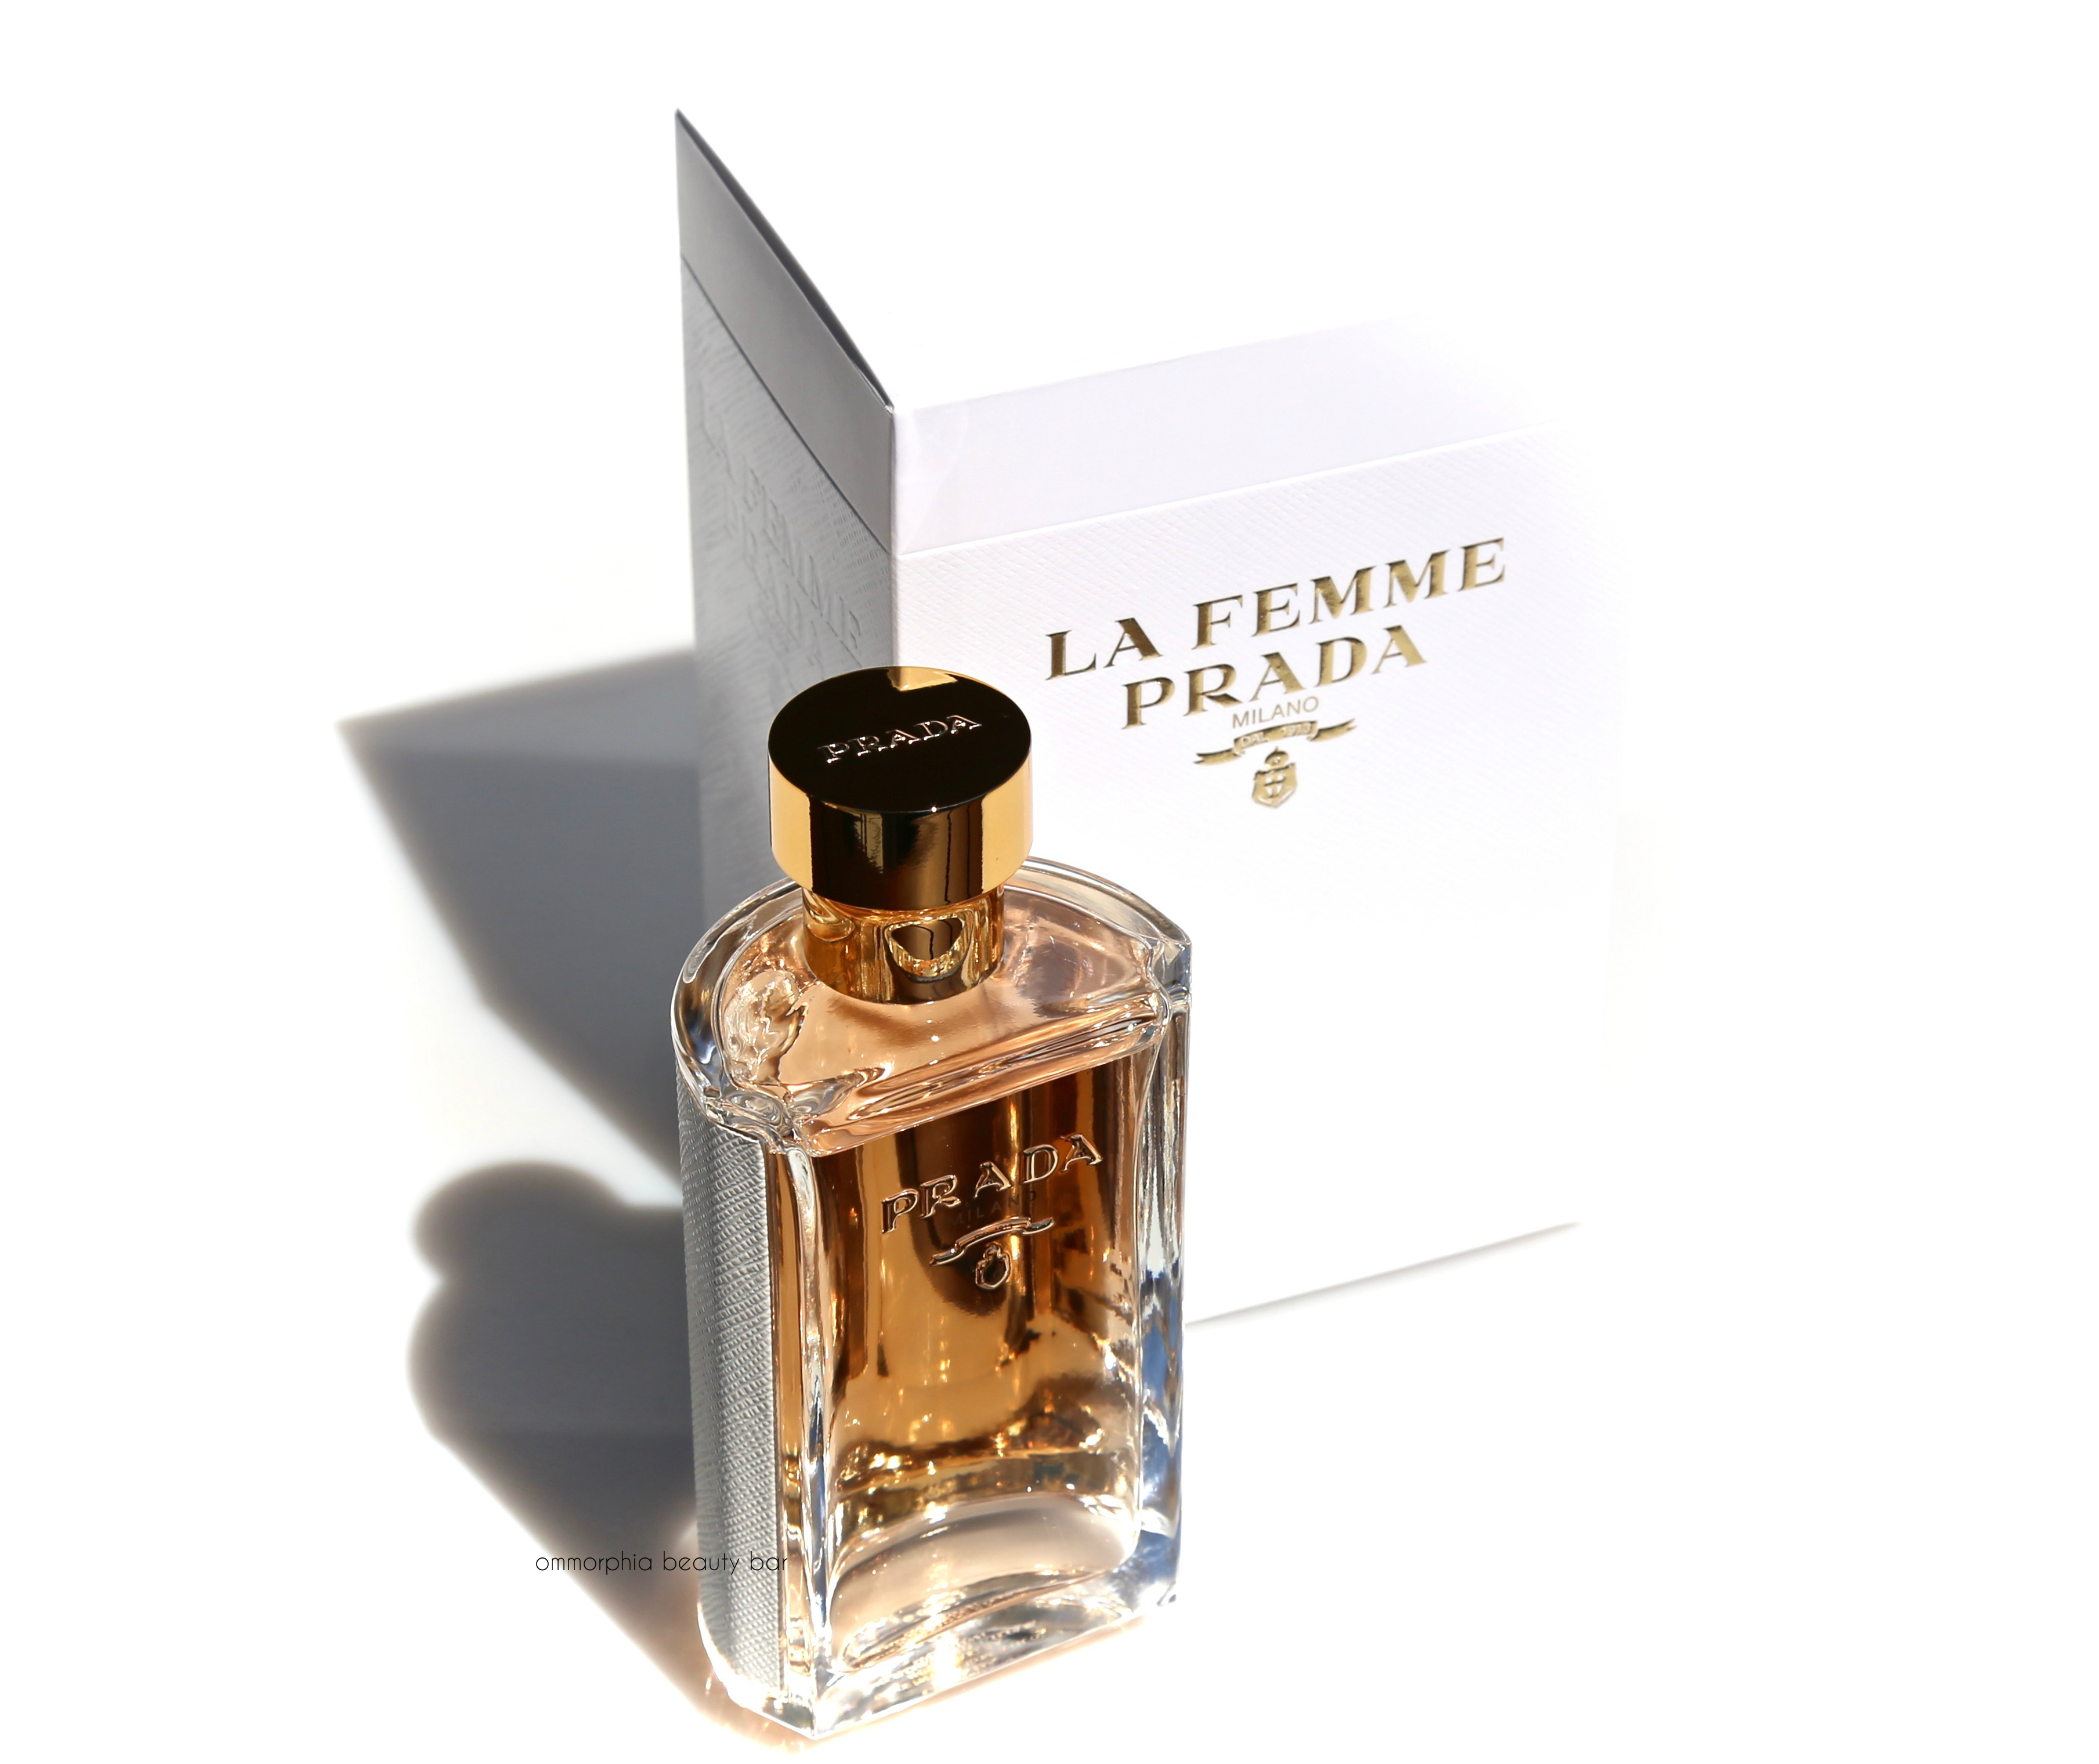 fa73457c7663 Prada Le Femme Eau de Parfum (CAN  165.00 100 ml)   Described as a warm  floriental, La Femme has effectively married the freshness of flowers with  the ...